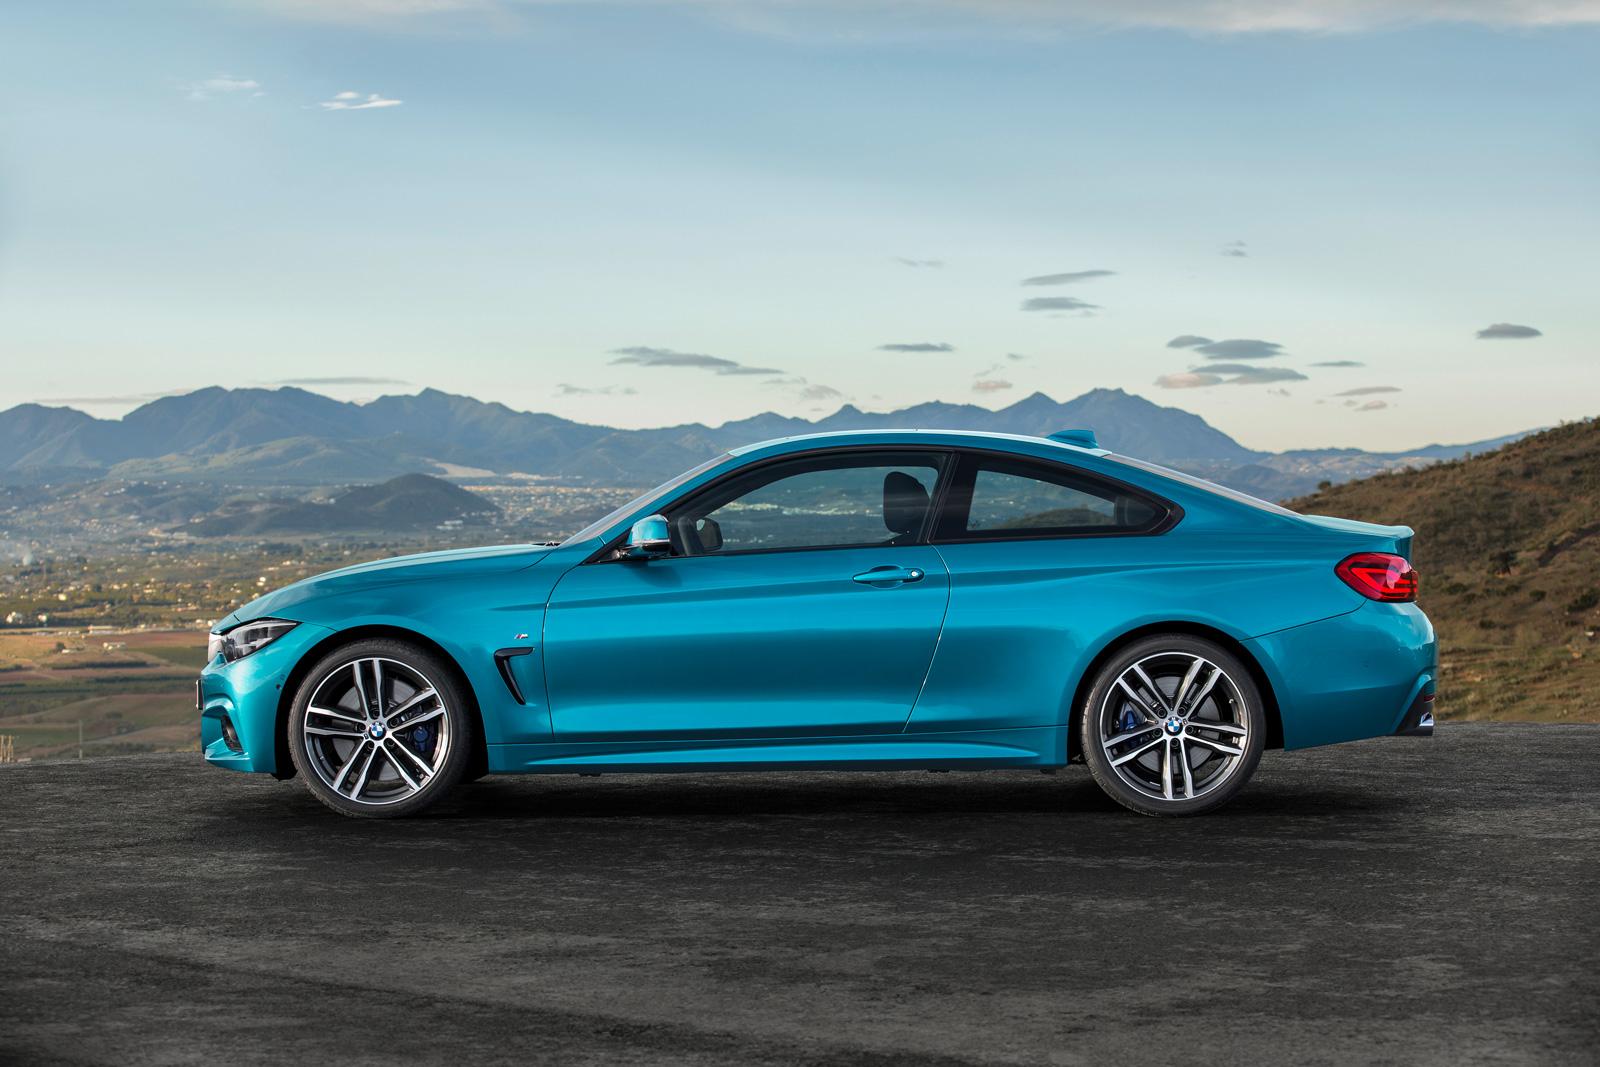 Startovao pilot projekat – pretplatom do BMW automobila